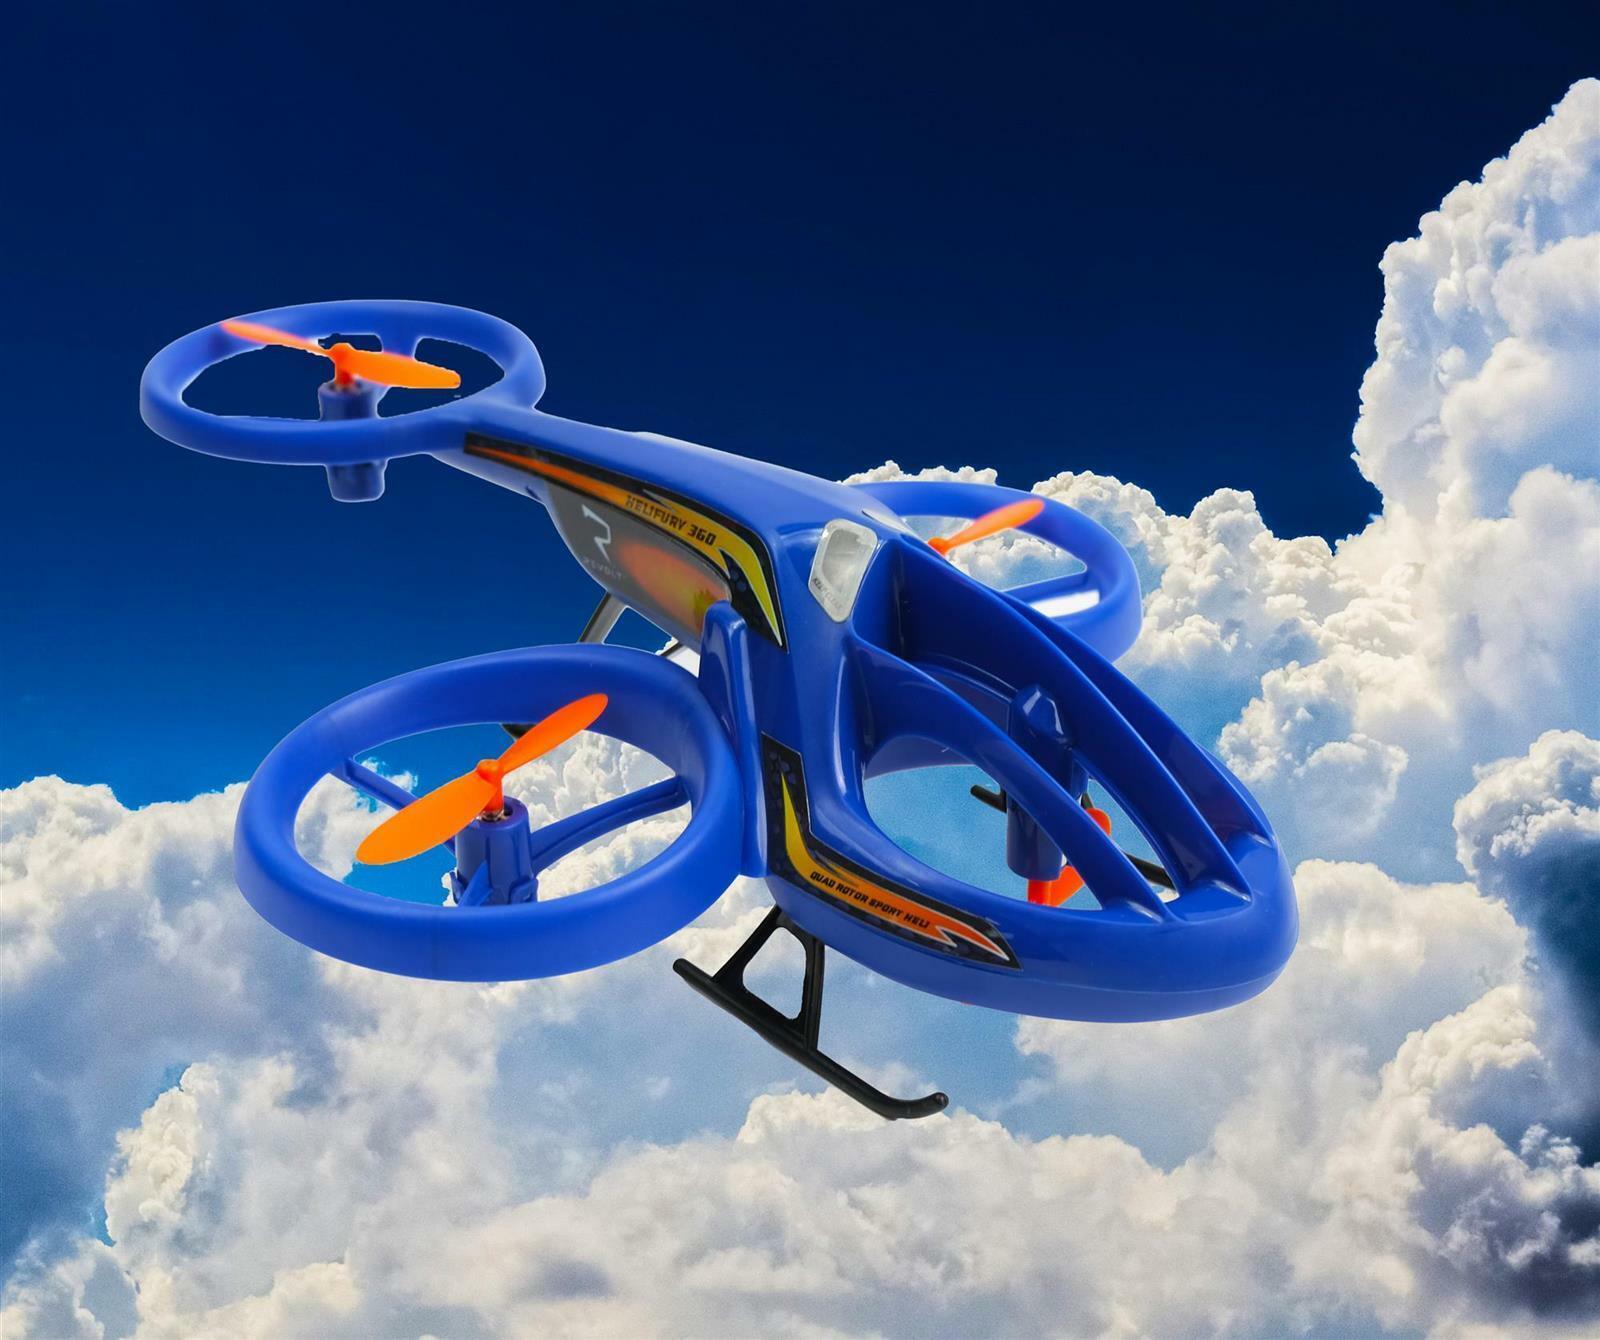 EFASO RC Hubschrauber Drohne Syma TF1001 2,4 Ghz 3,5 KanaI autom. Höhehalten LED